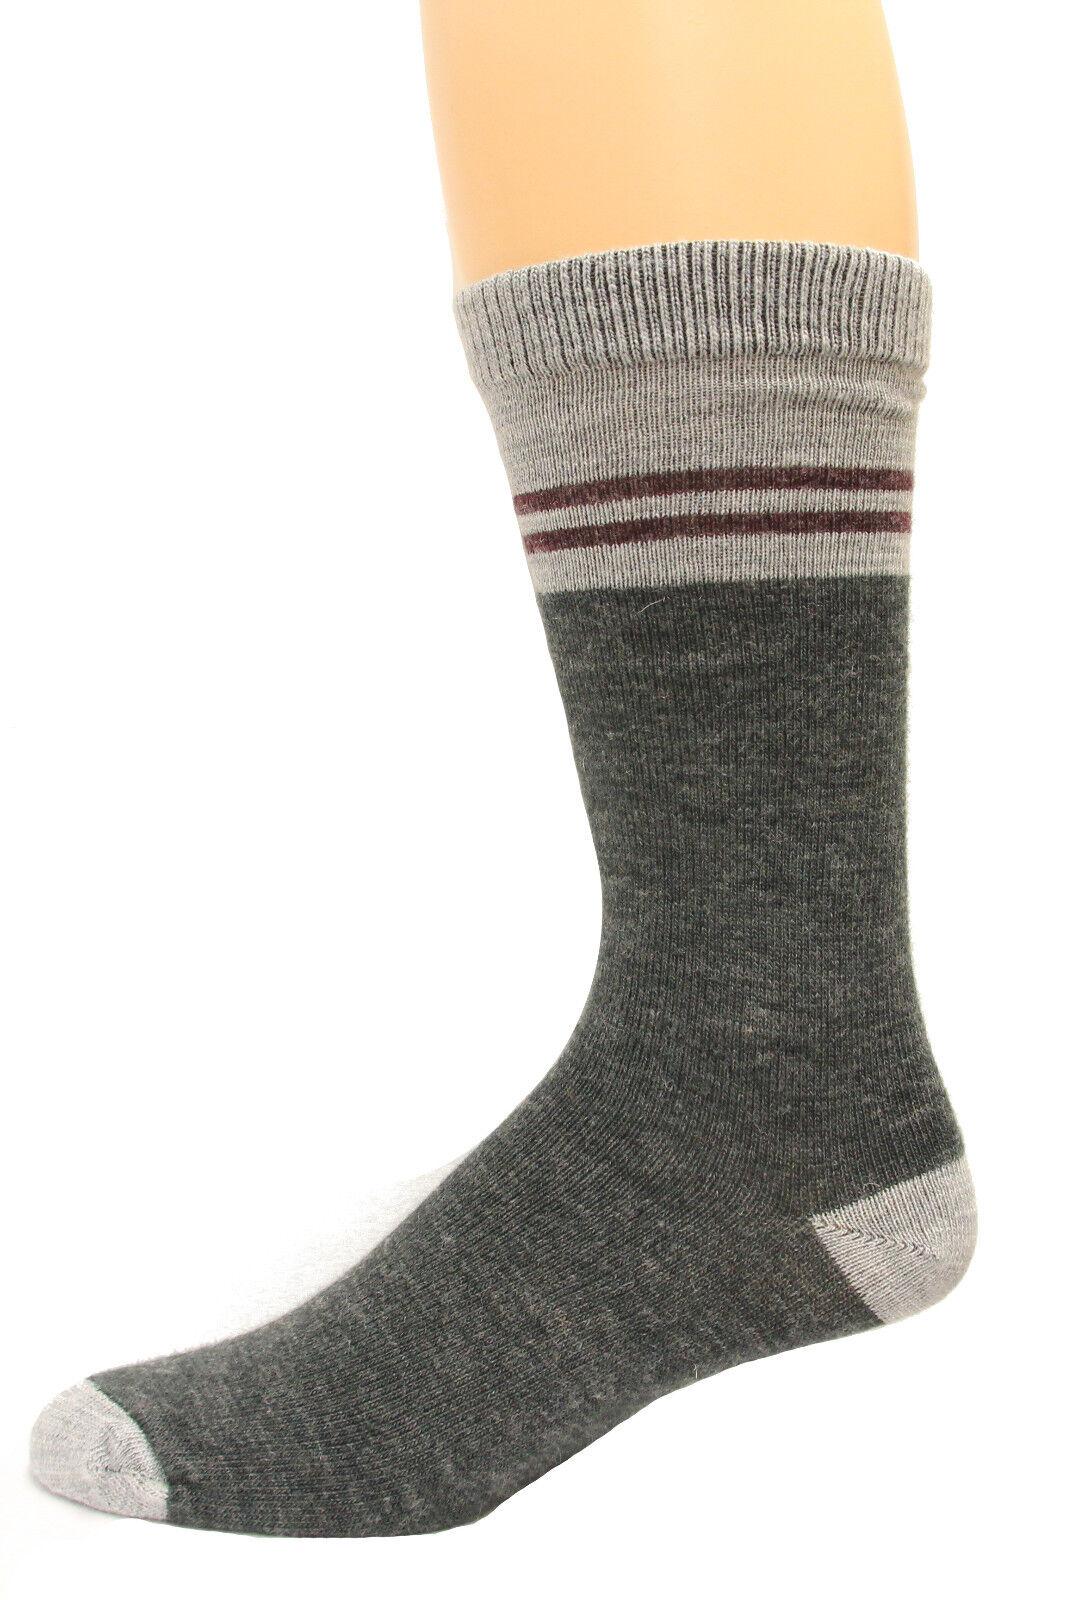 Wise Blend Men's Pinstripe Crew Socks, 1 Pair, Medium, Shoe Size M 9-13 (778)